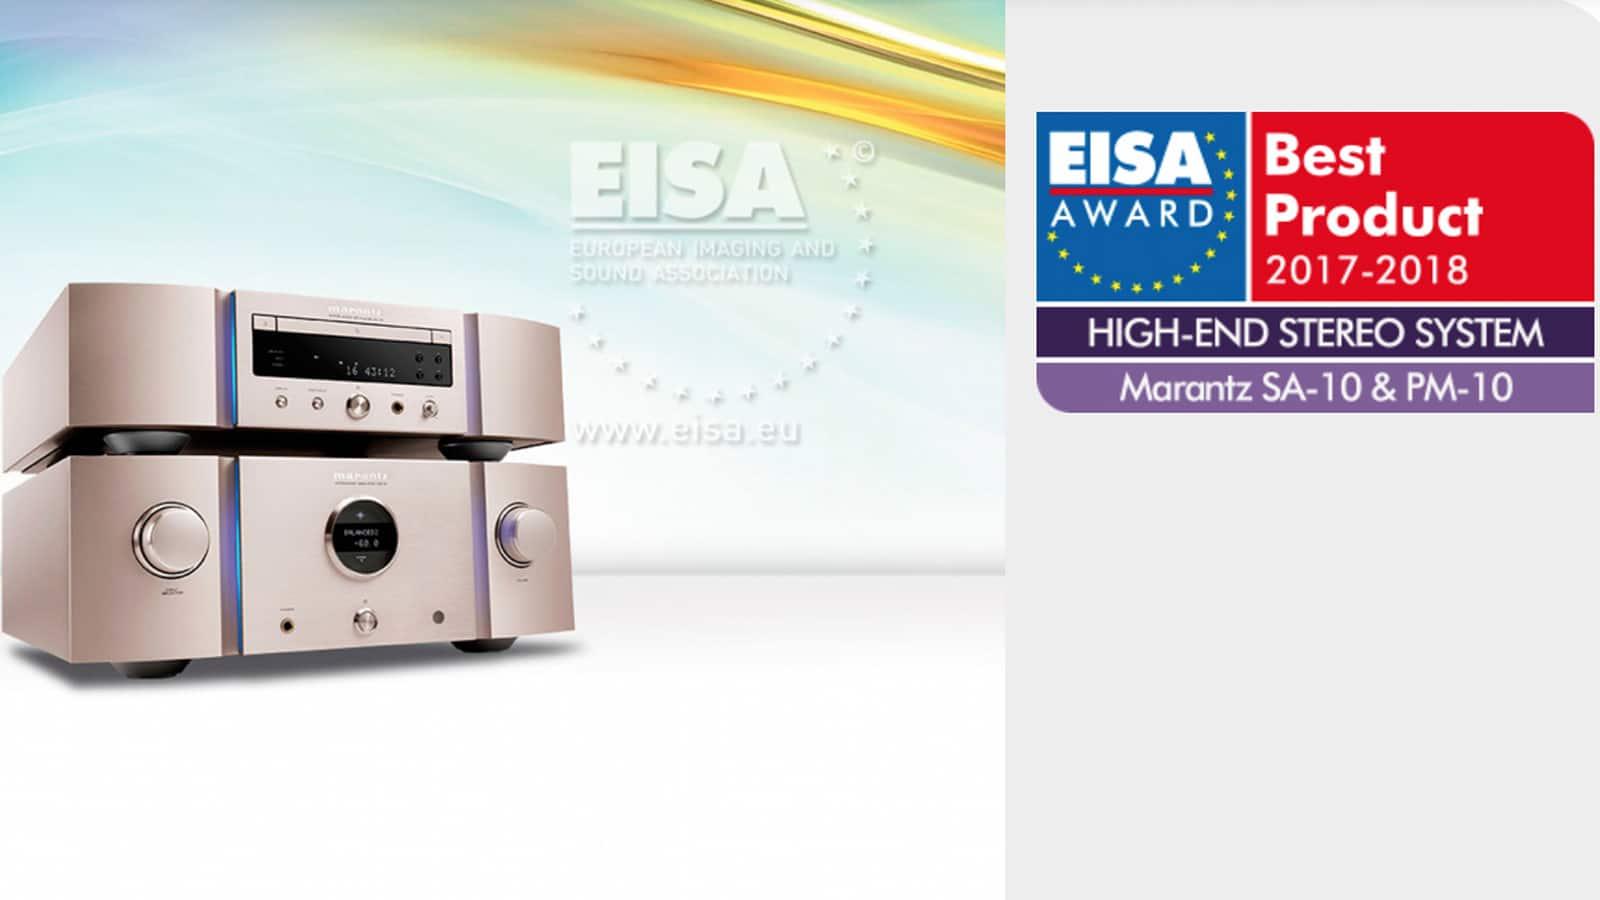 marantz-sa10-pm10-wins-eisa-award